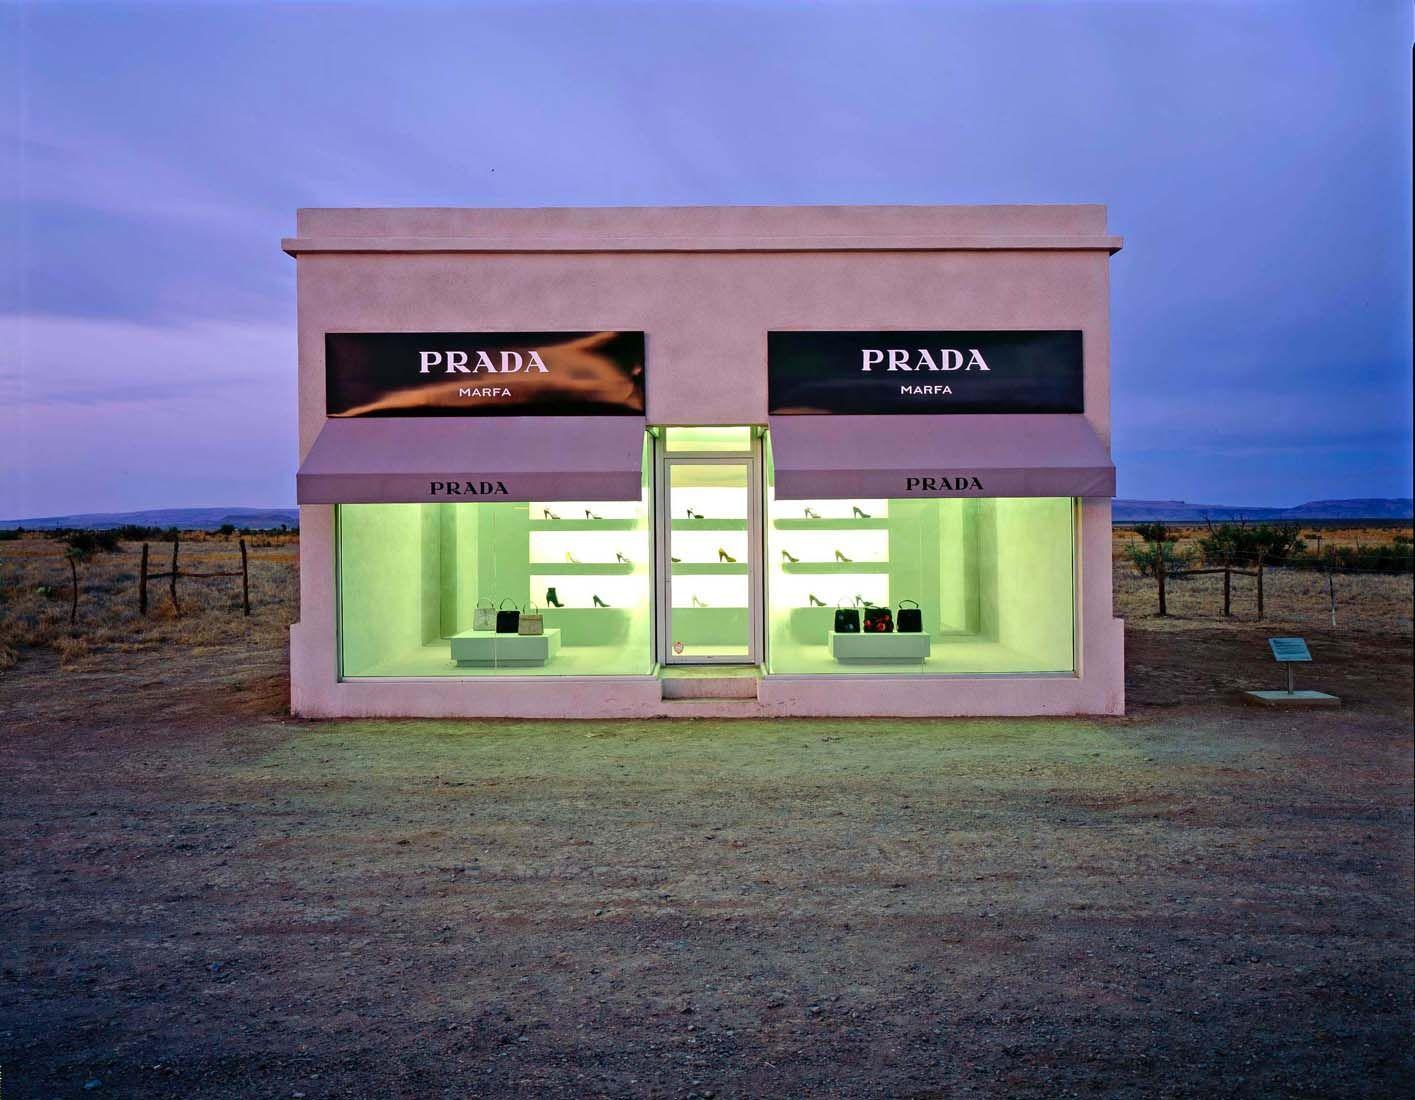 Burk Uzzle Desert Prada, 2007